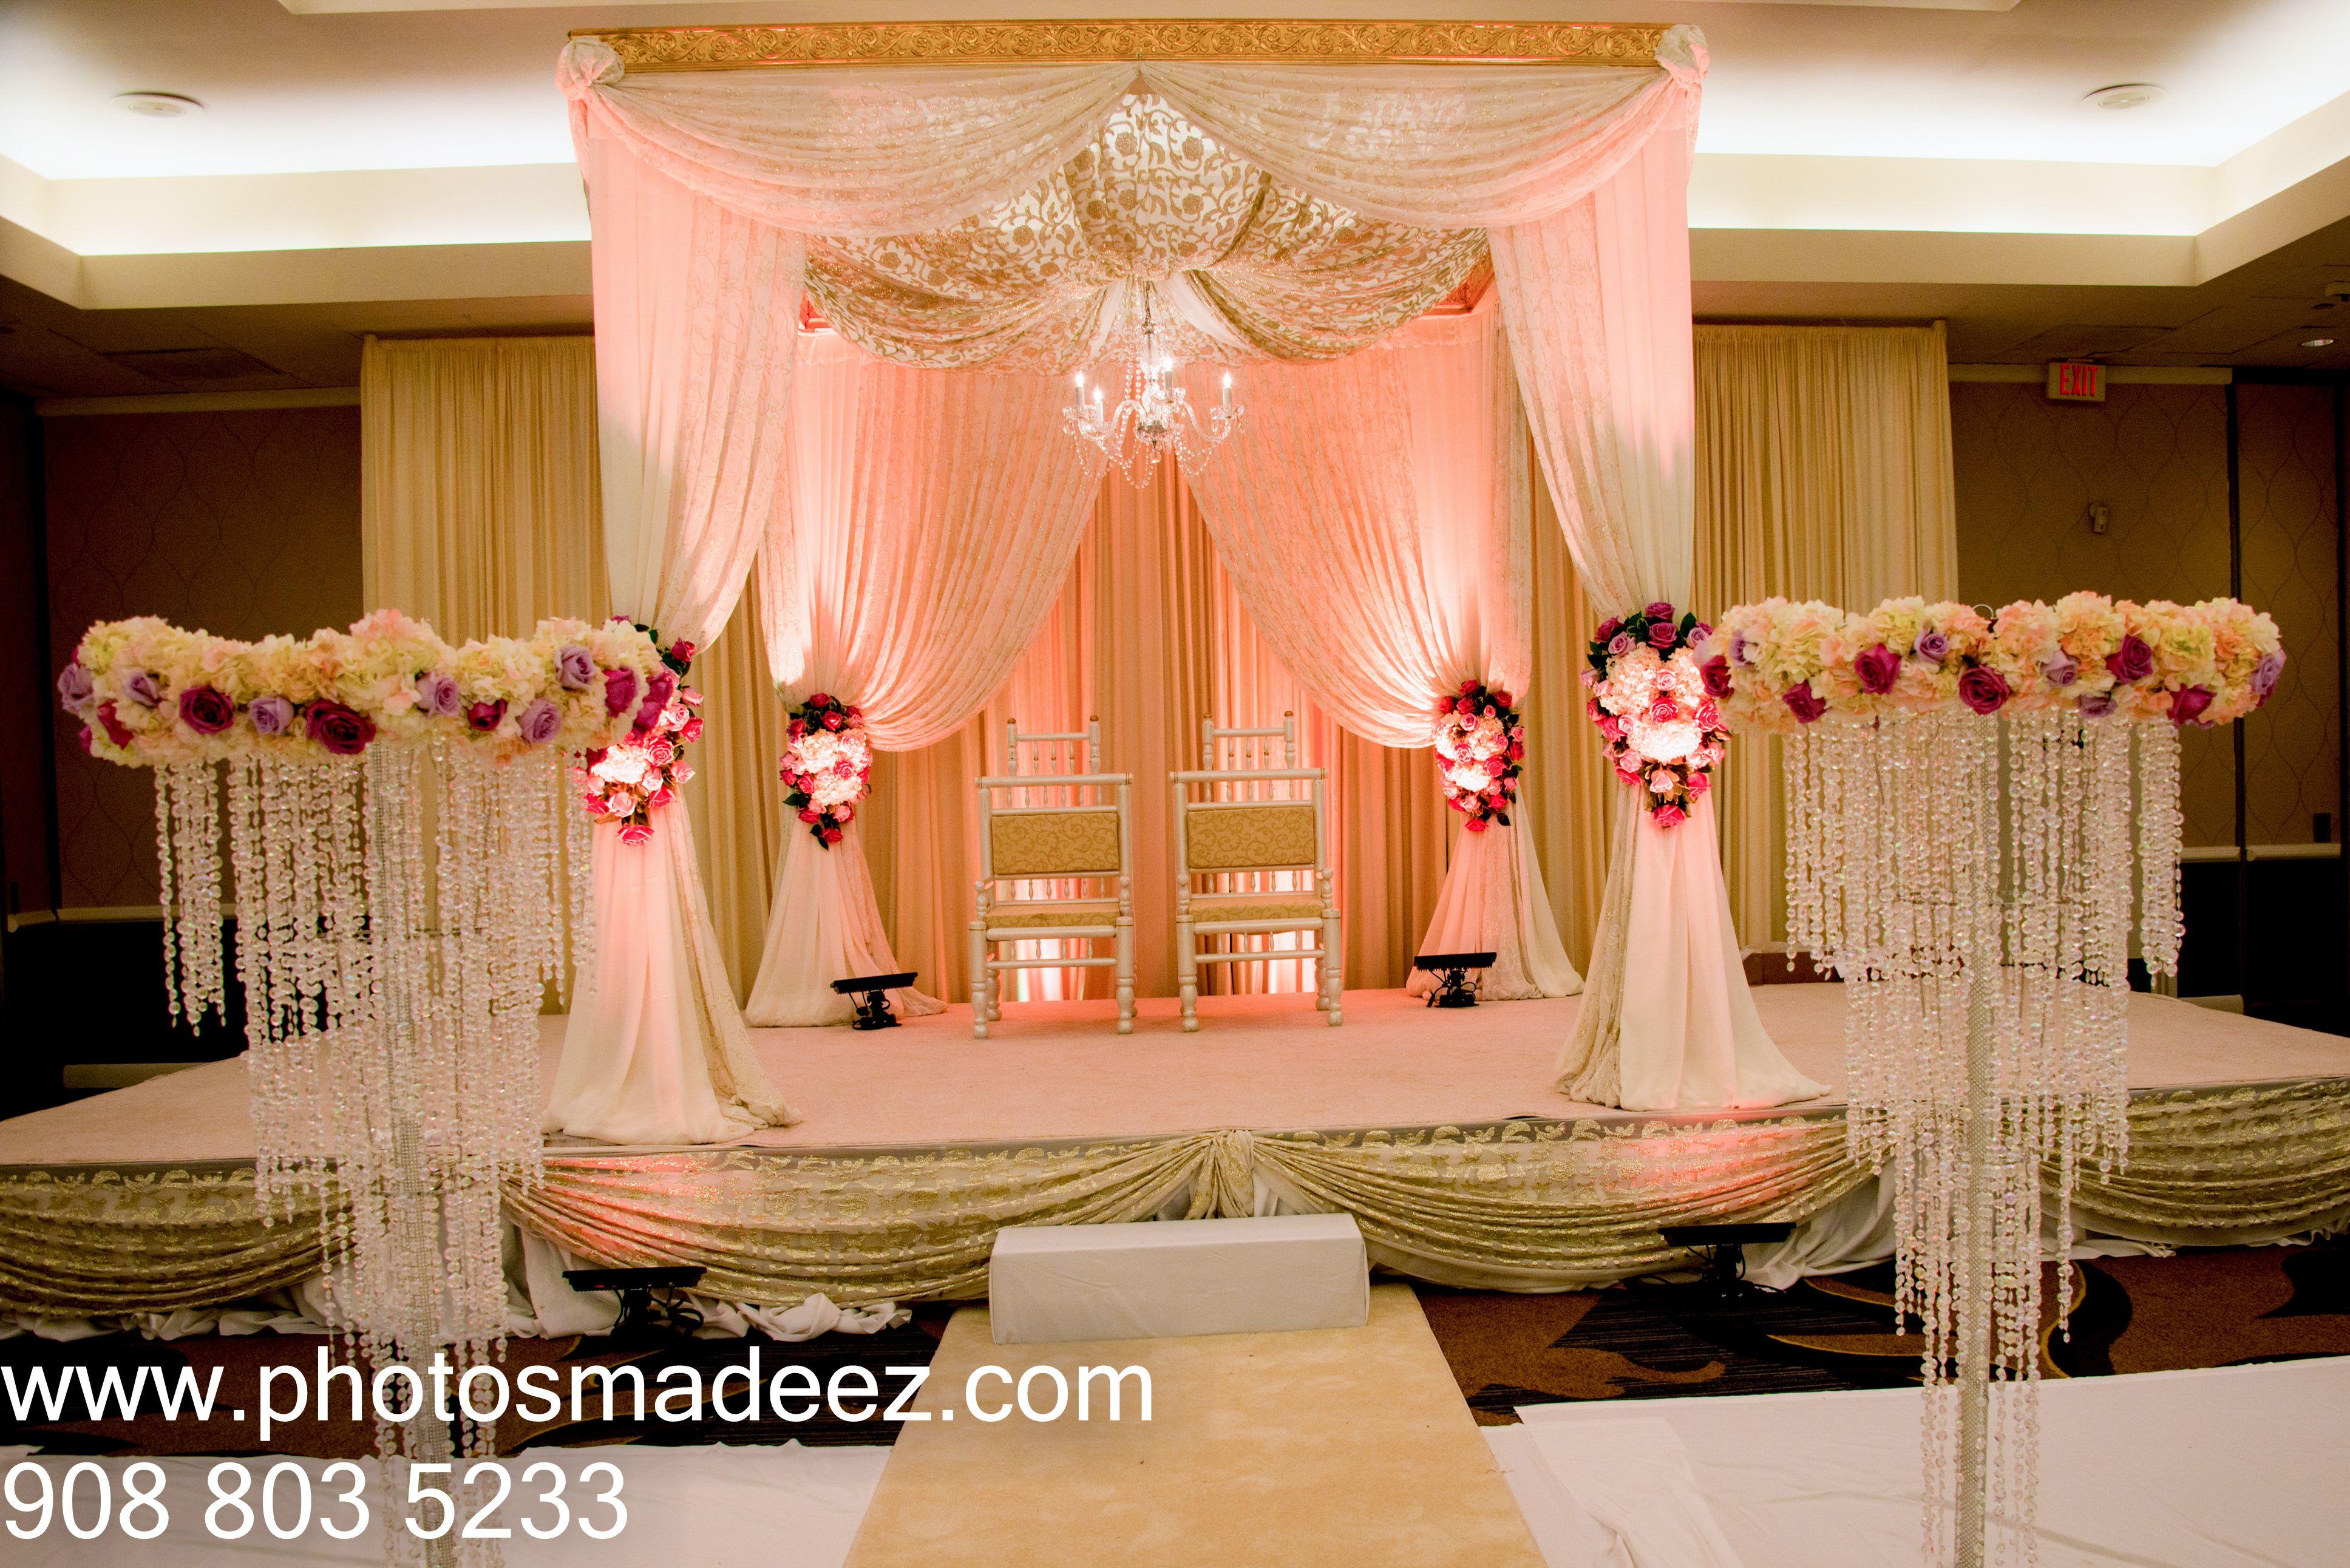 beach wedding in new jersey%0A Mandap for Wedding at Sheraton Parsippany  NJ  Punjabi Wedding in New Jersey   Along